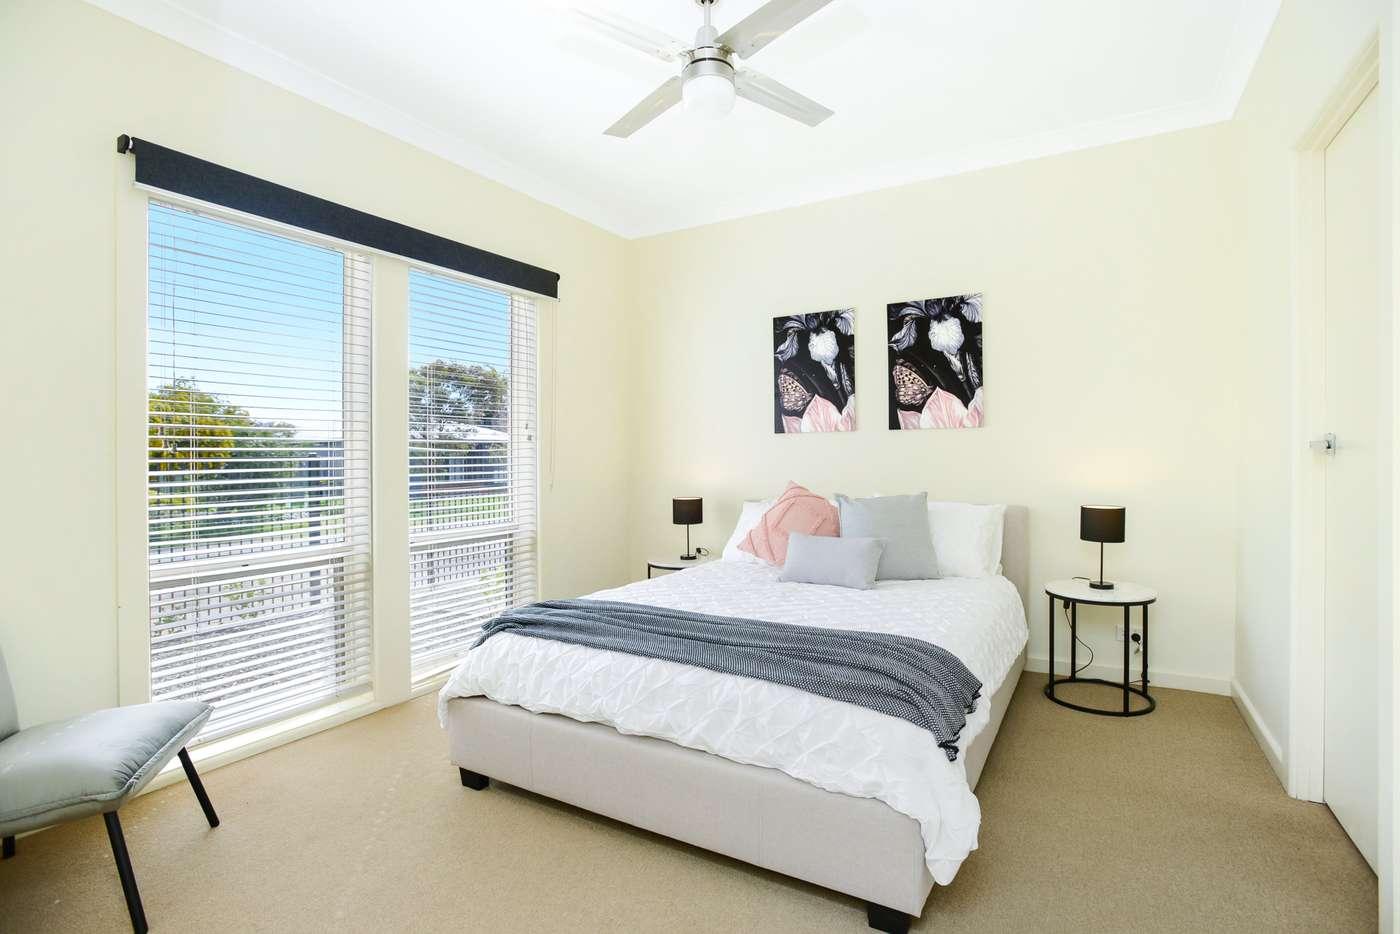 Seventh view of Homely house listing, 45 Whinnerah Avenue, Aldinga Beach SA 5173